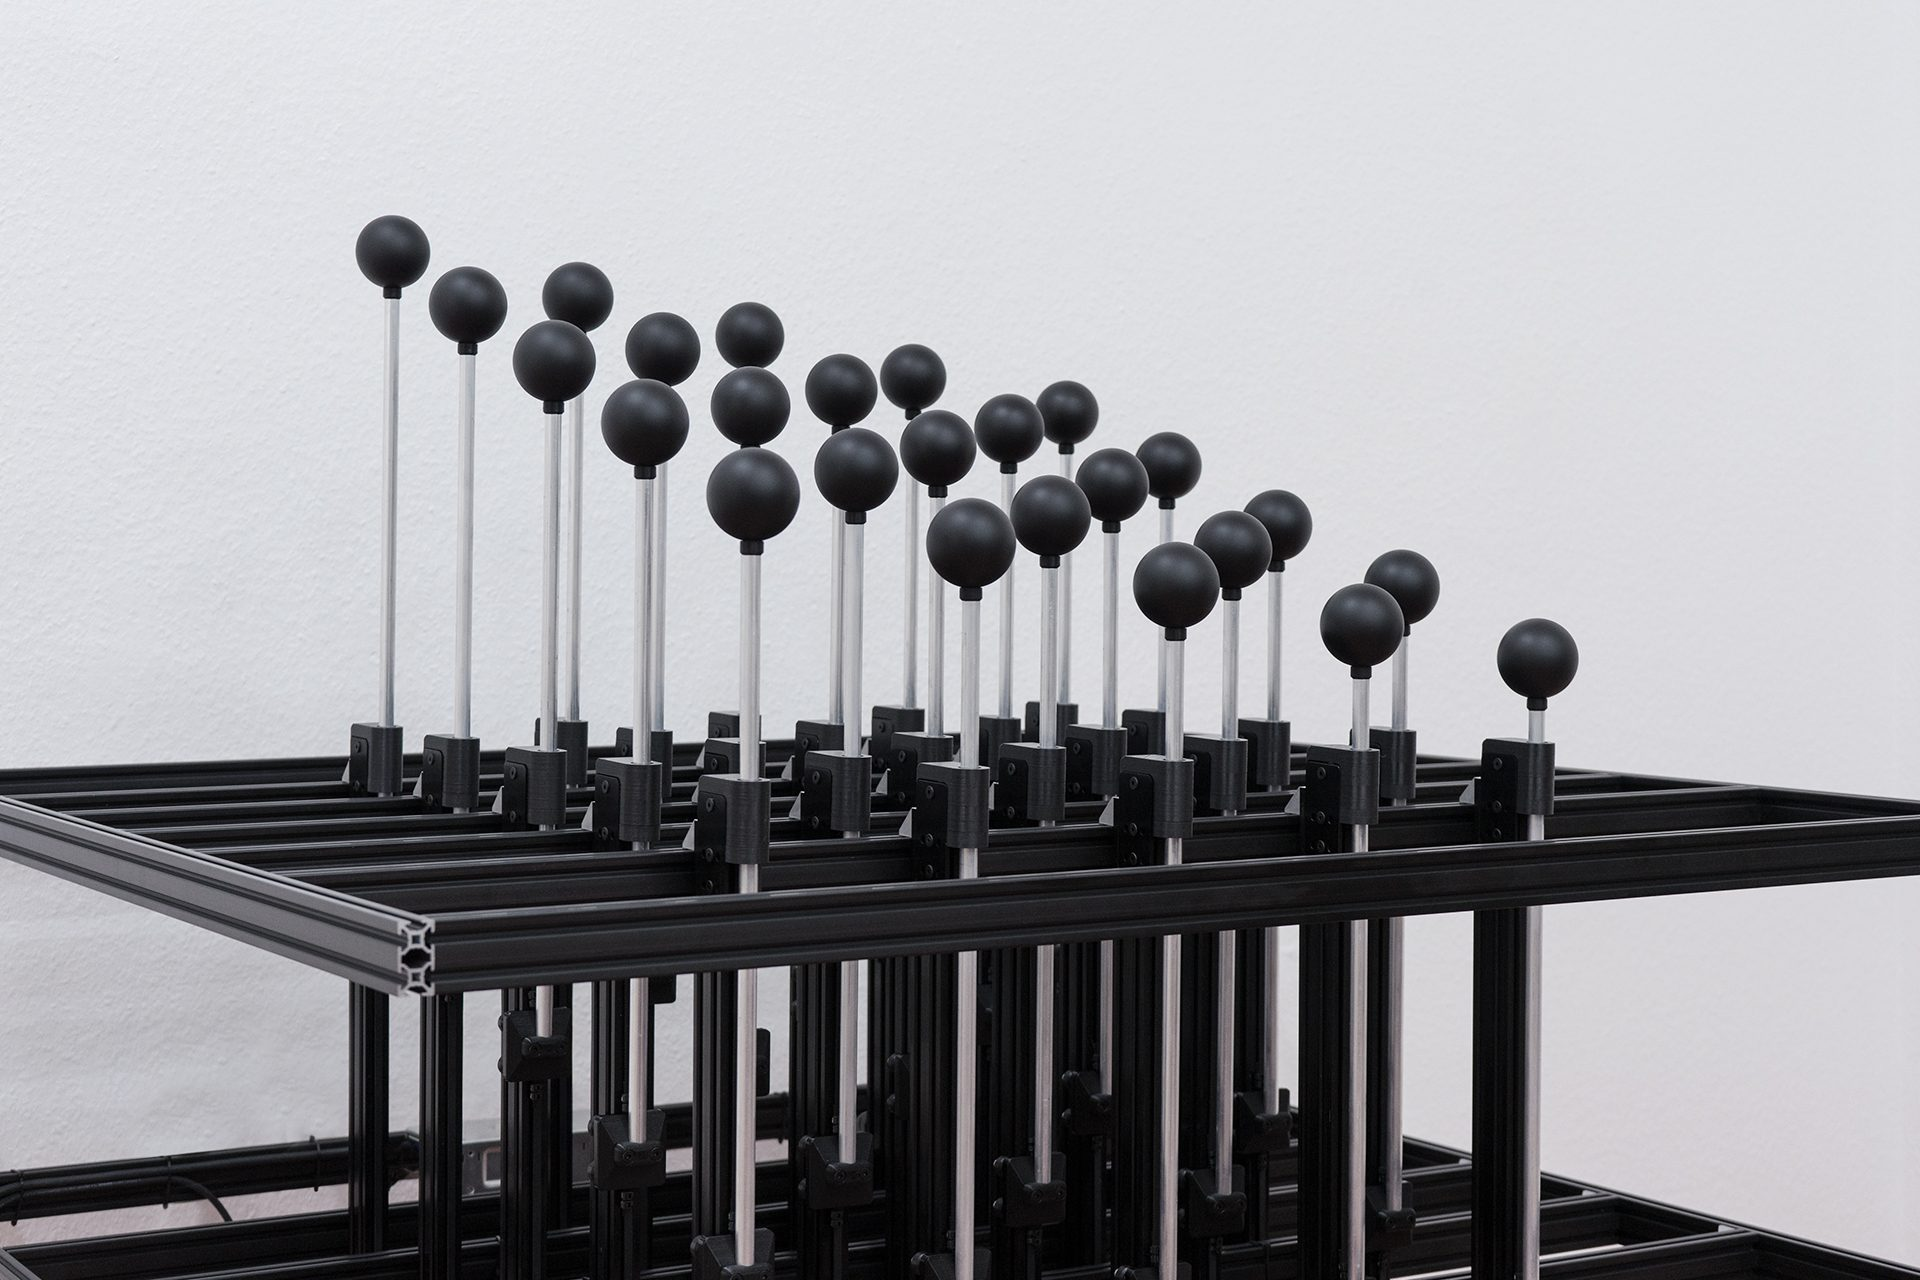 DMX Linear Actuator Slim with a black sphere fixture